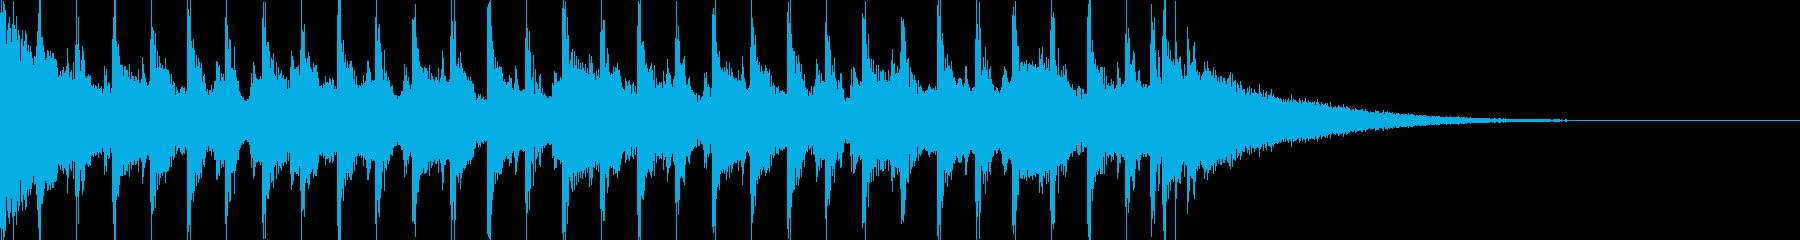 Happy Ukulele 8の再生済みの波形